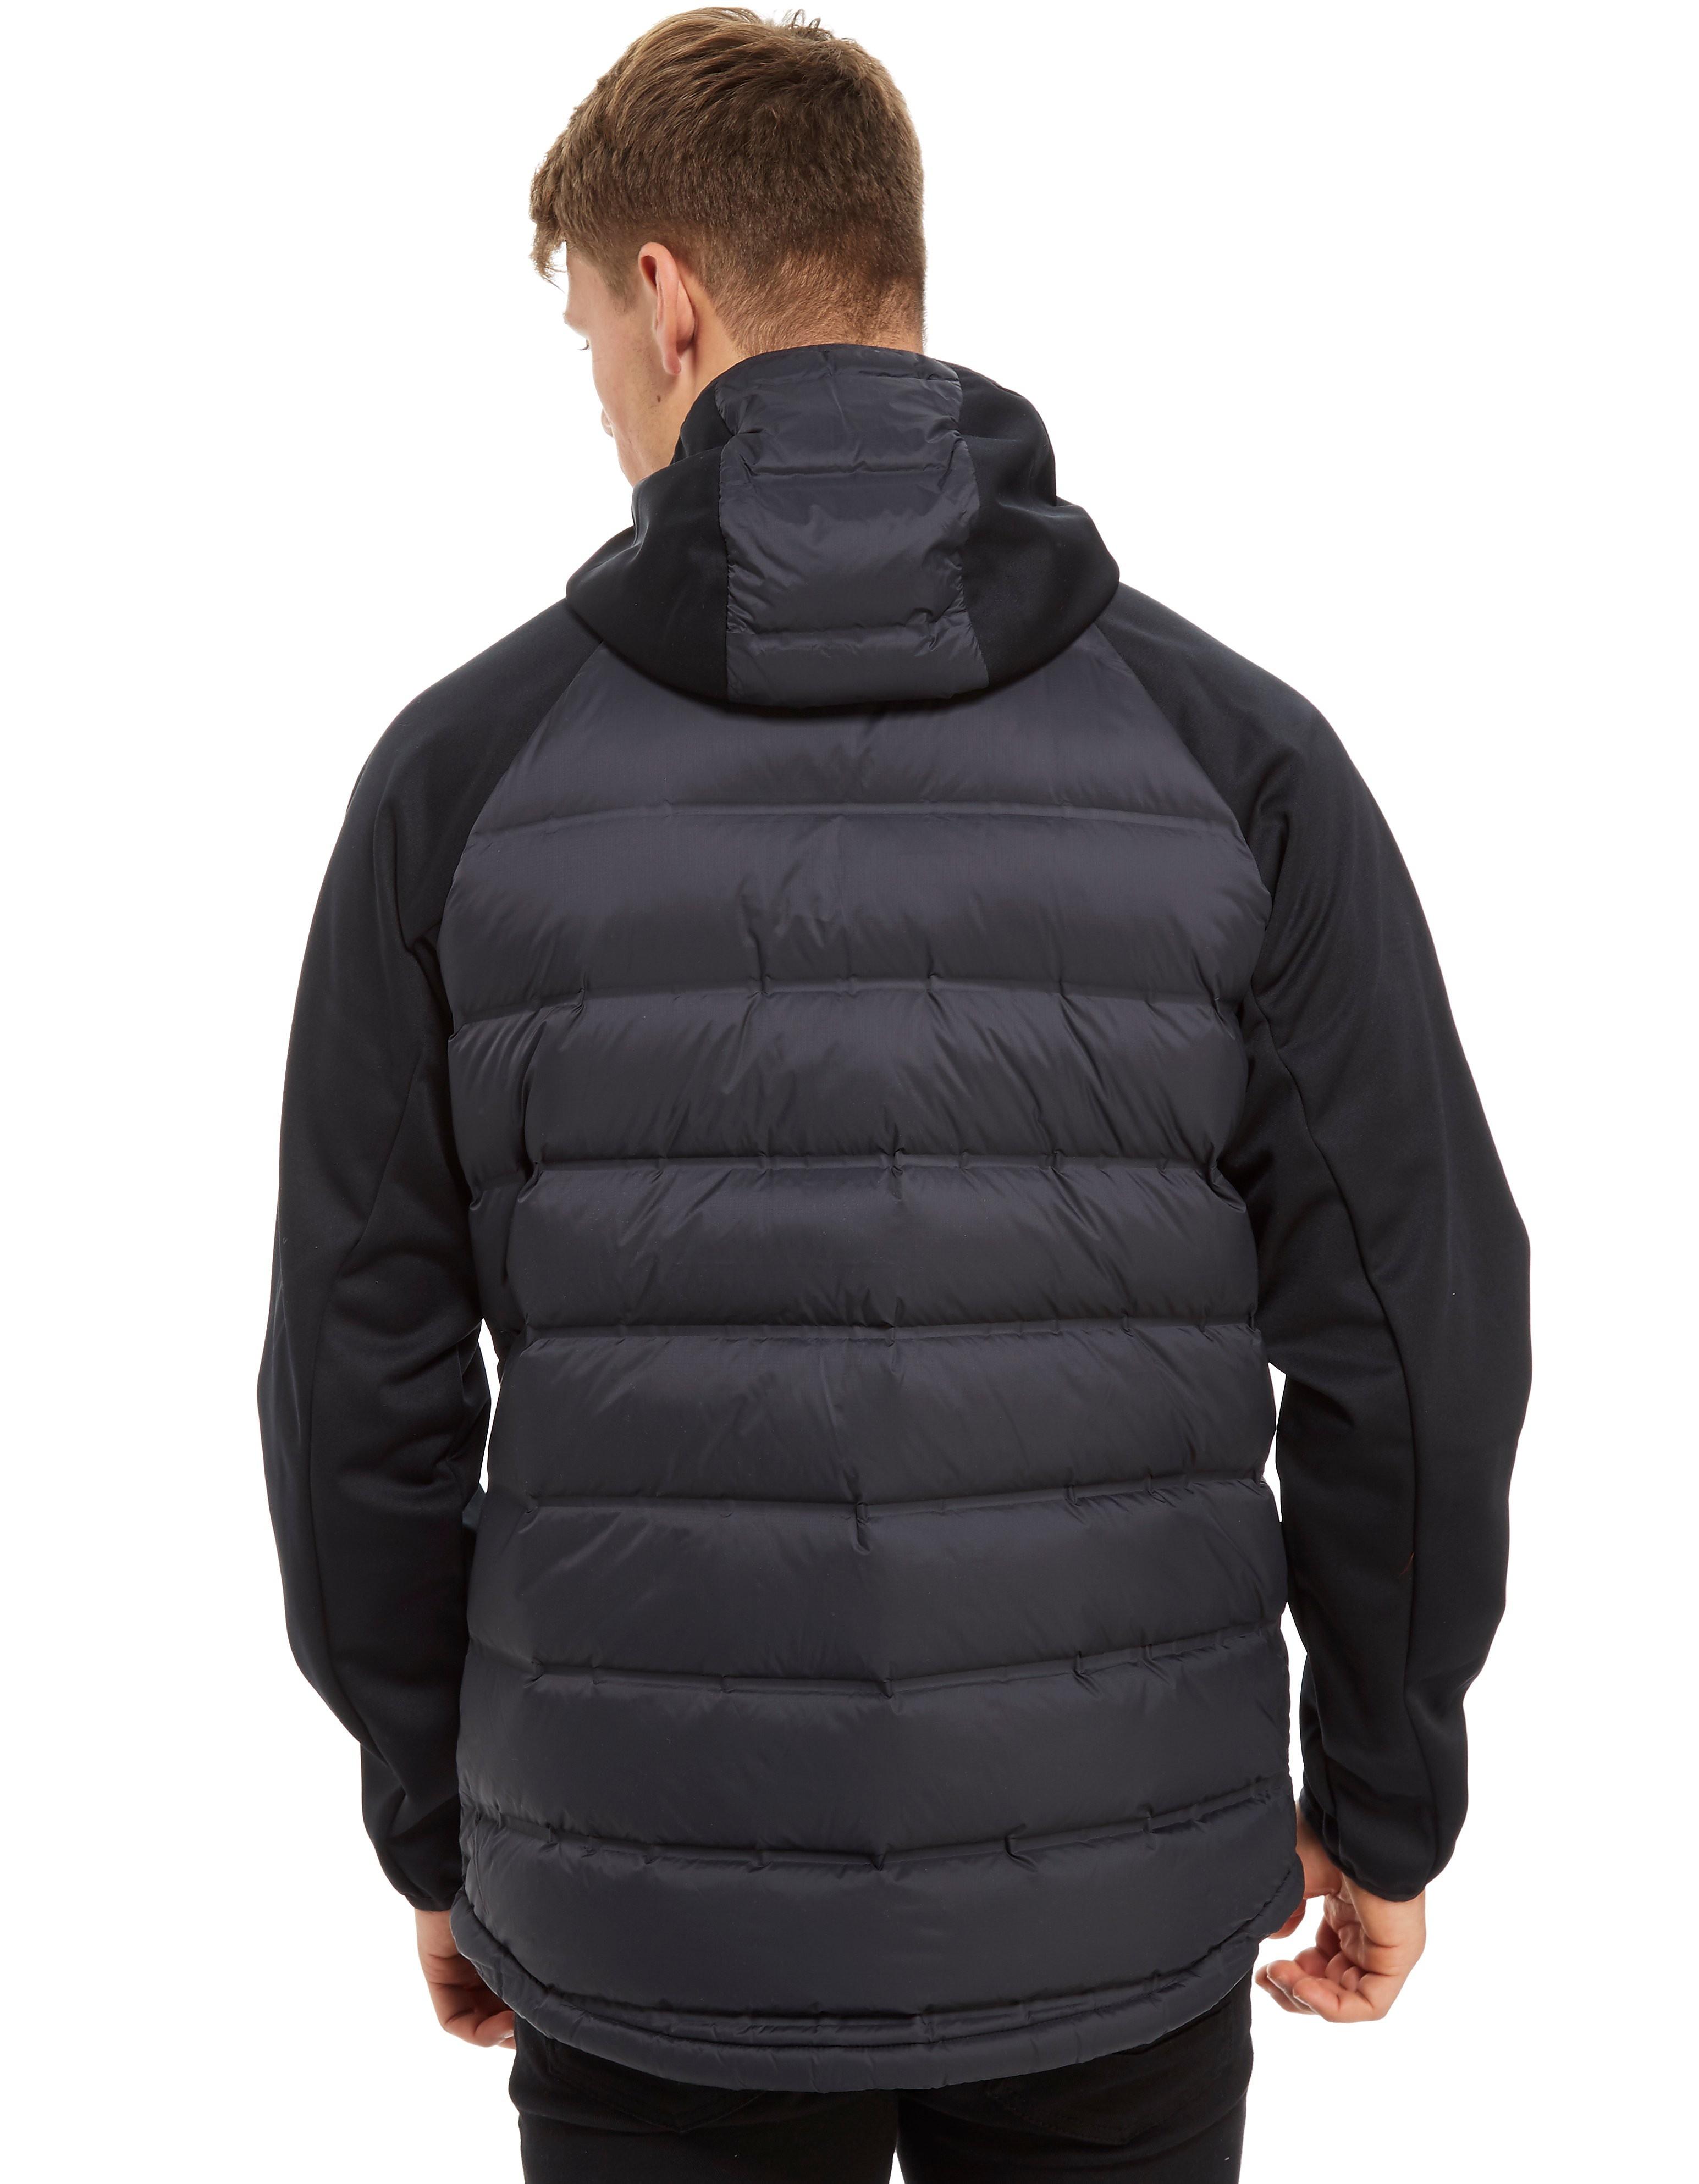 Columbia Northern Comfort Insulated Hoodie Jacket